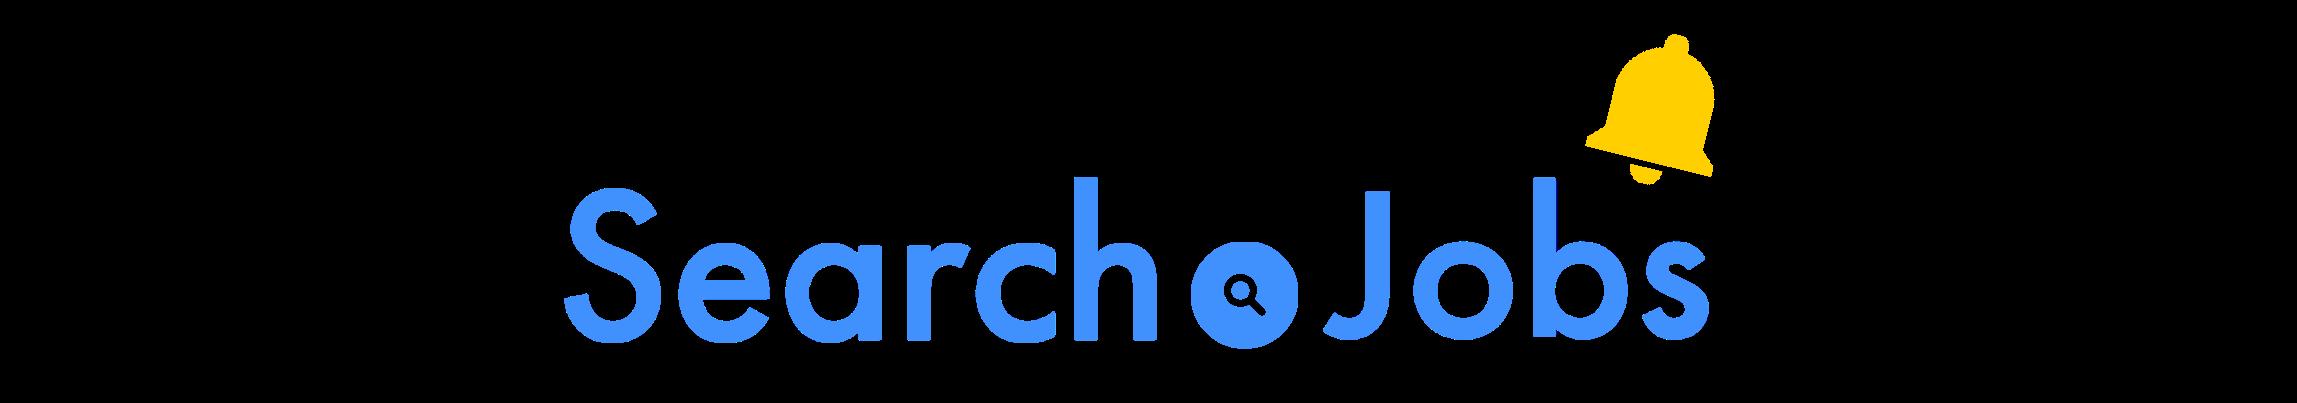 search.jobs push logo